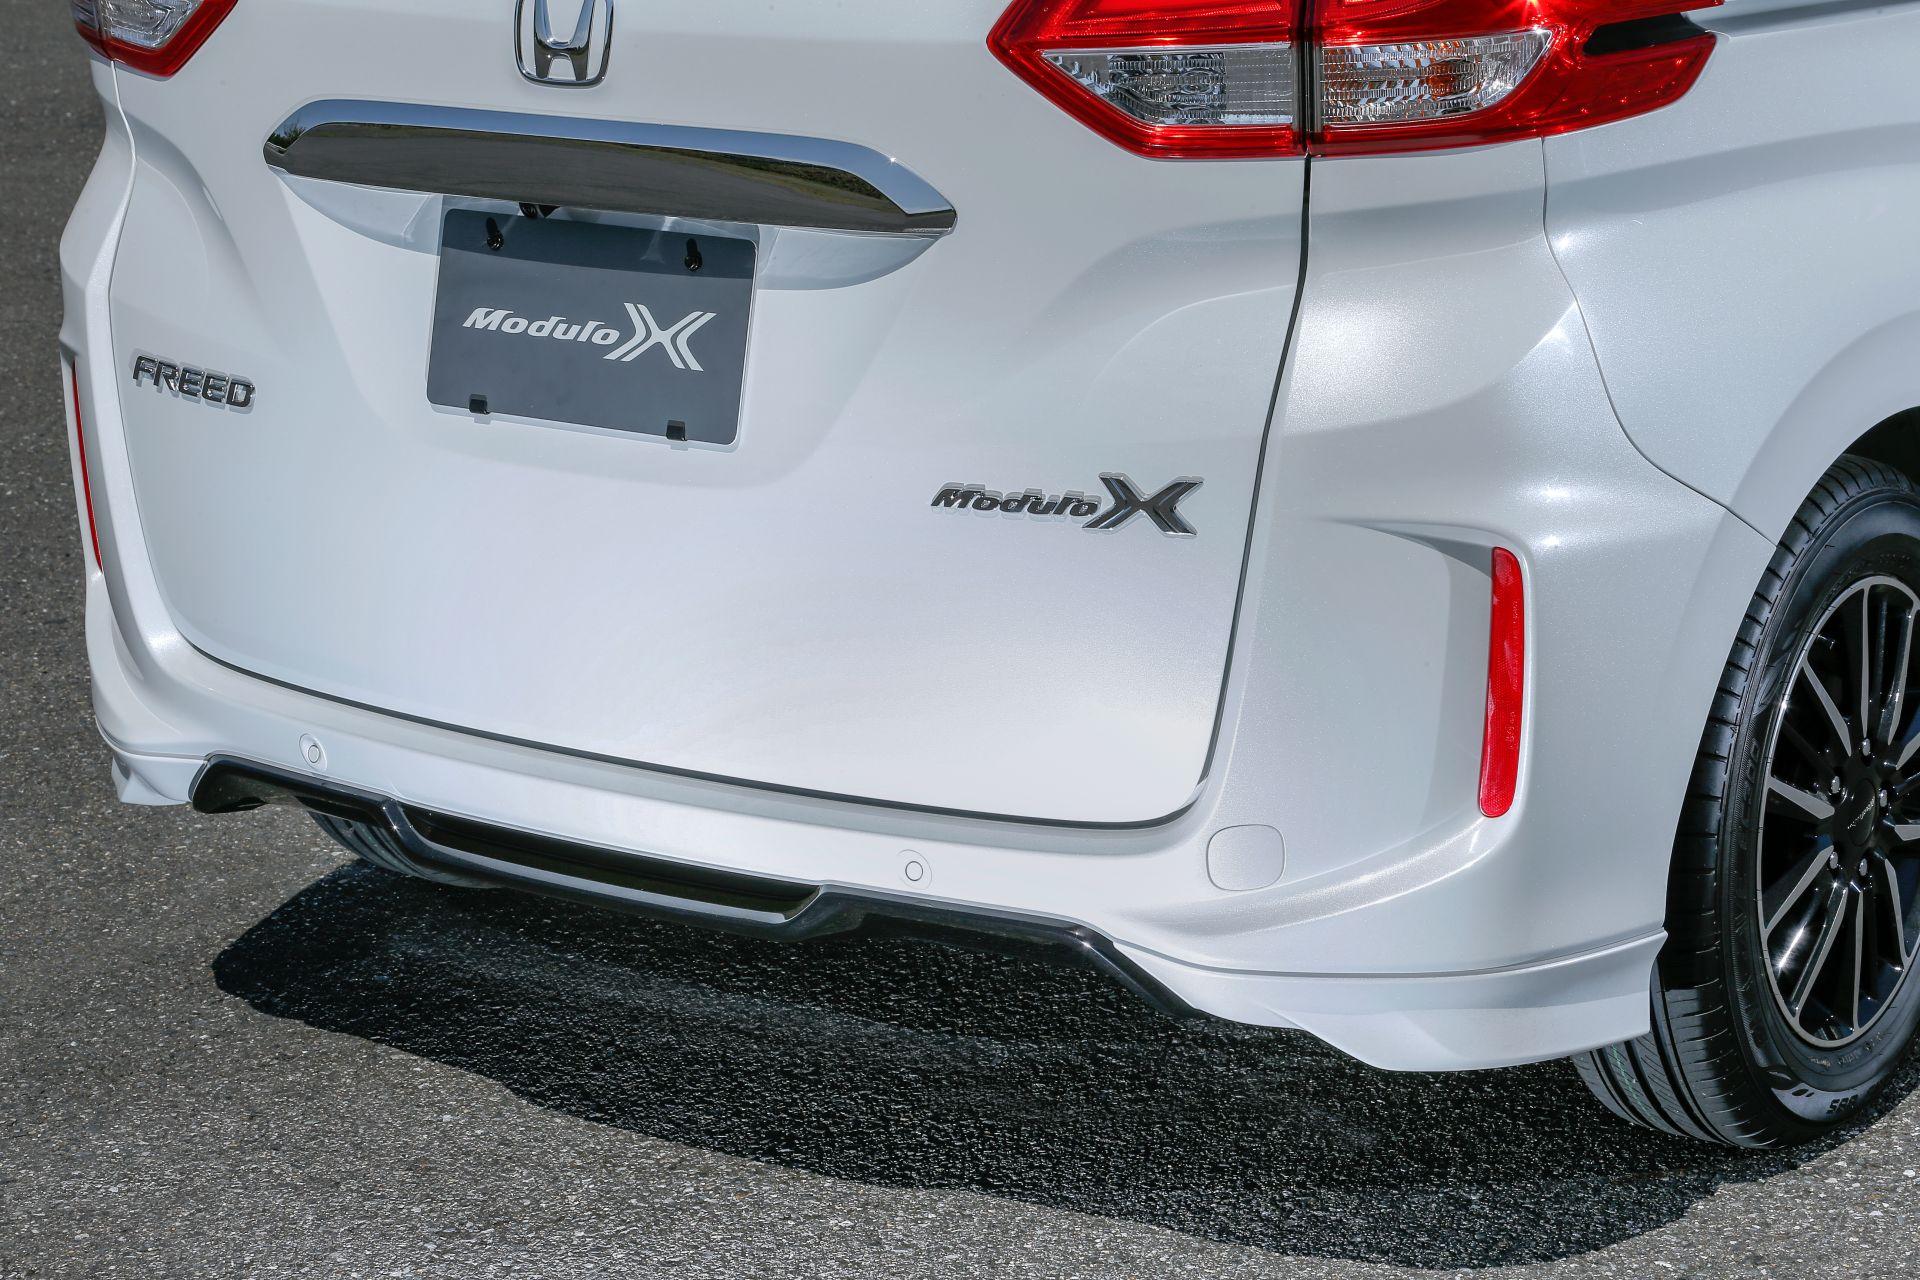 Honda-Freed-Modulo-X-Facelift-2020-23